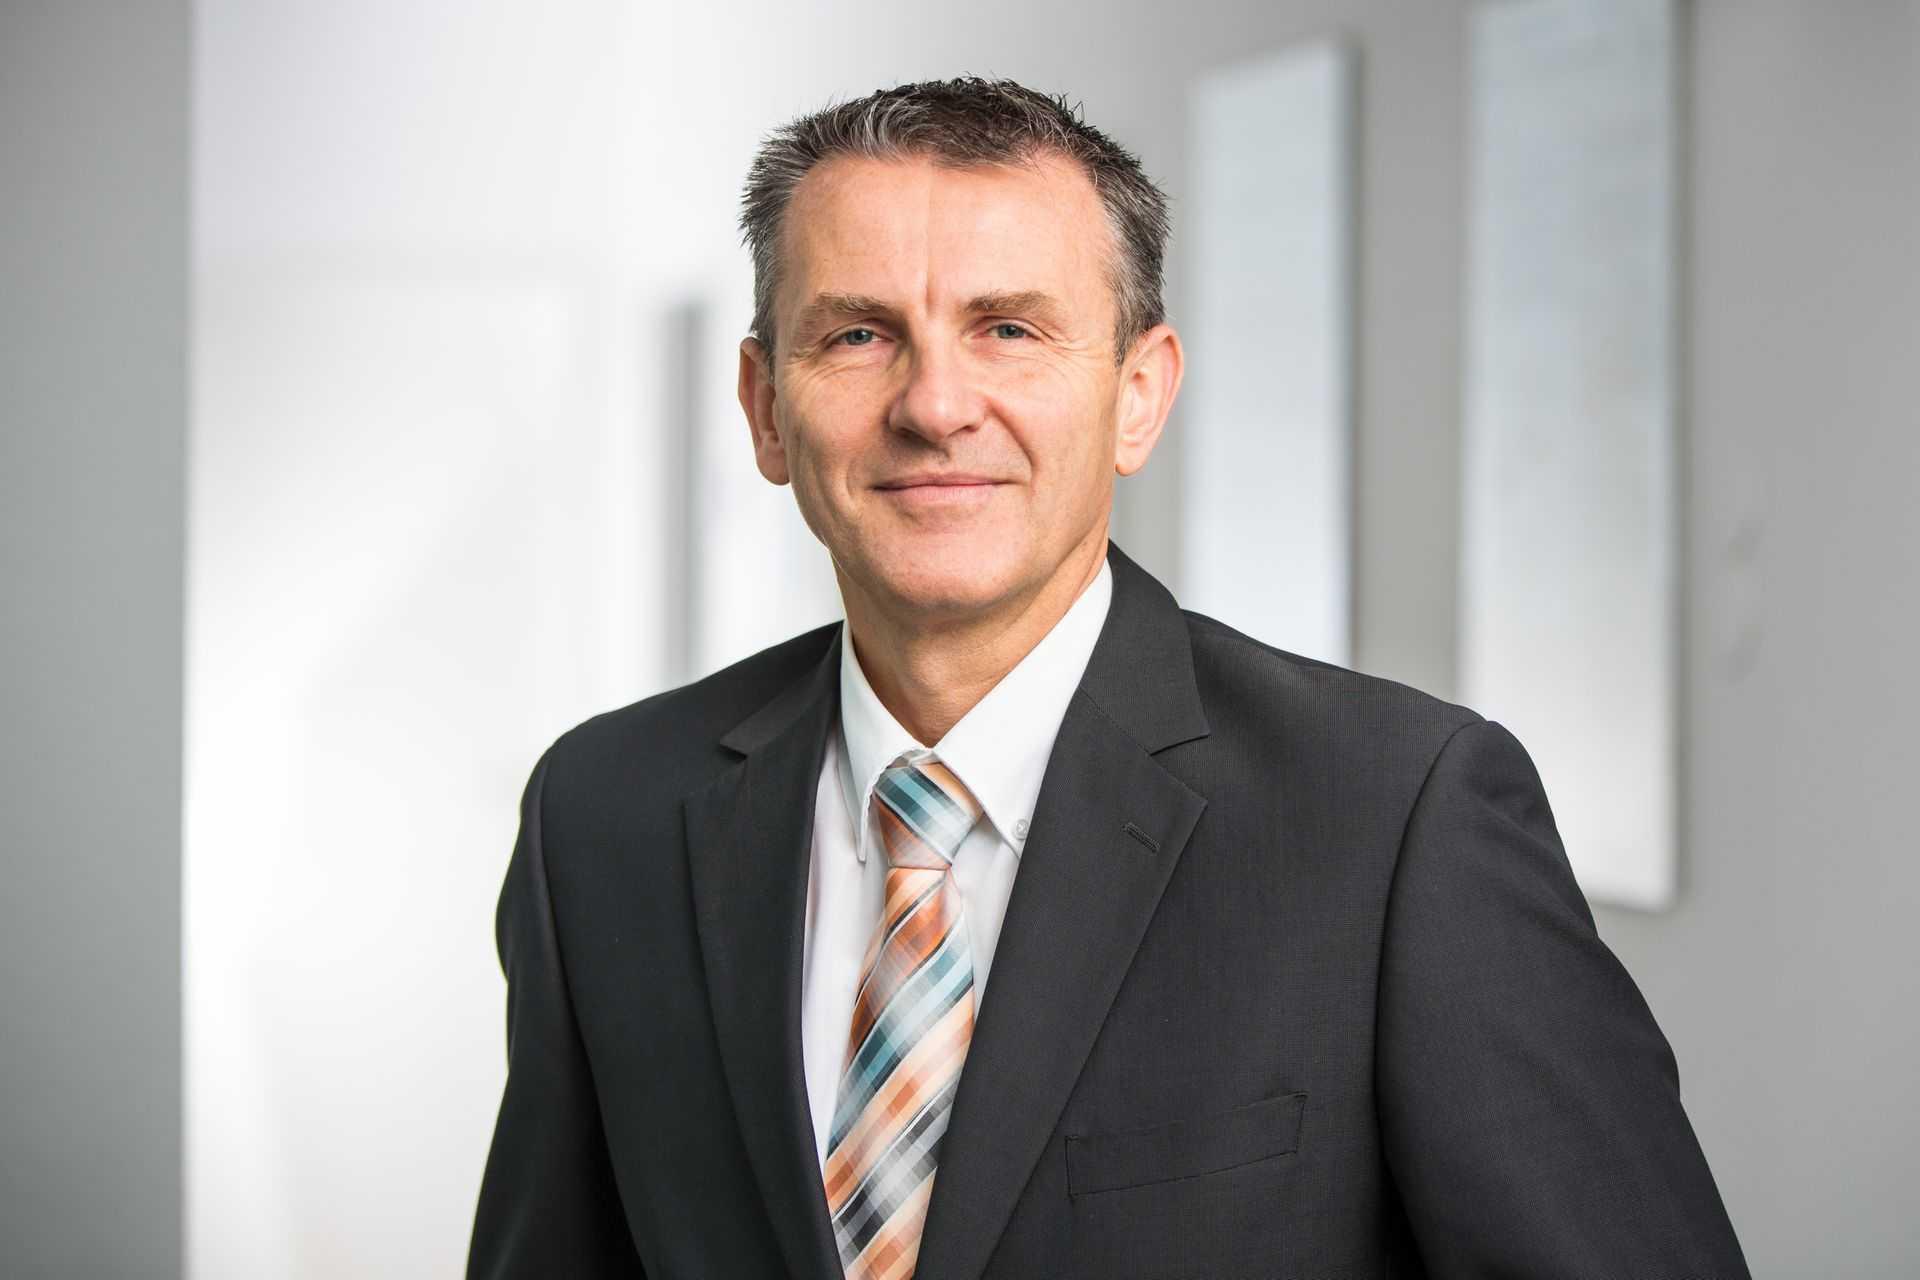 Prof. Dr. Michael Uhlmann